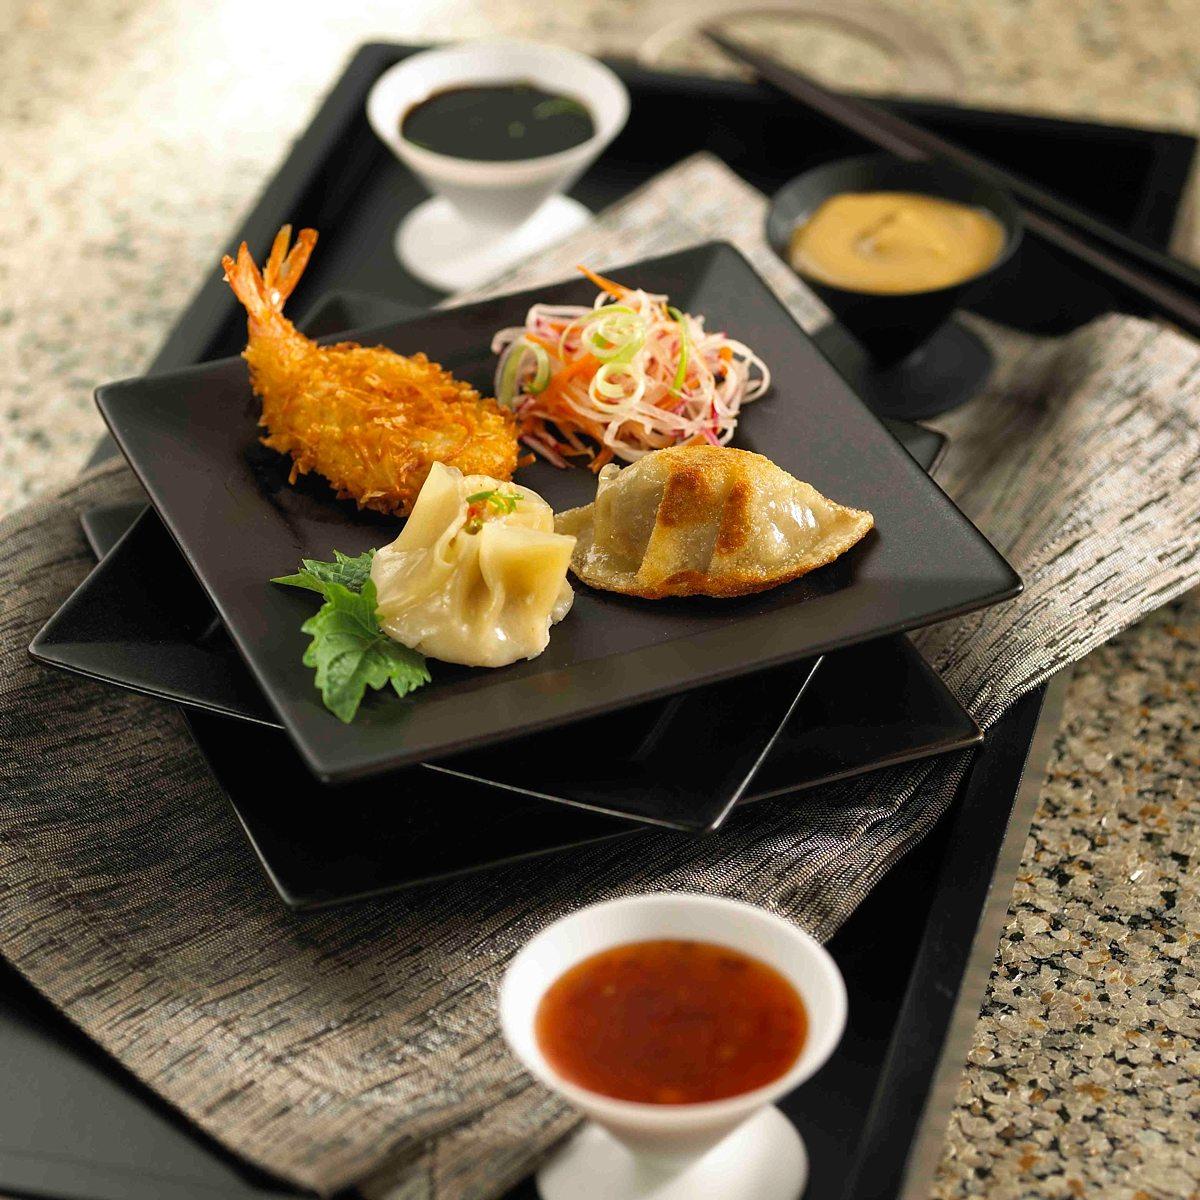 Haute-Tea-Entertaining-Company-Asian-Cuisine-Catering-02